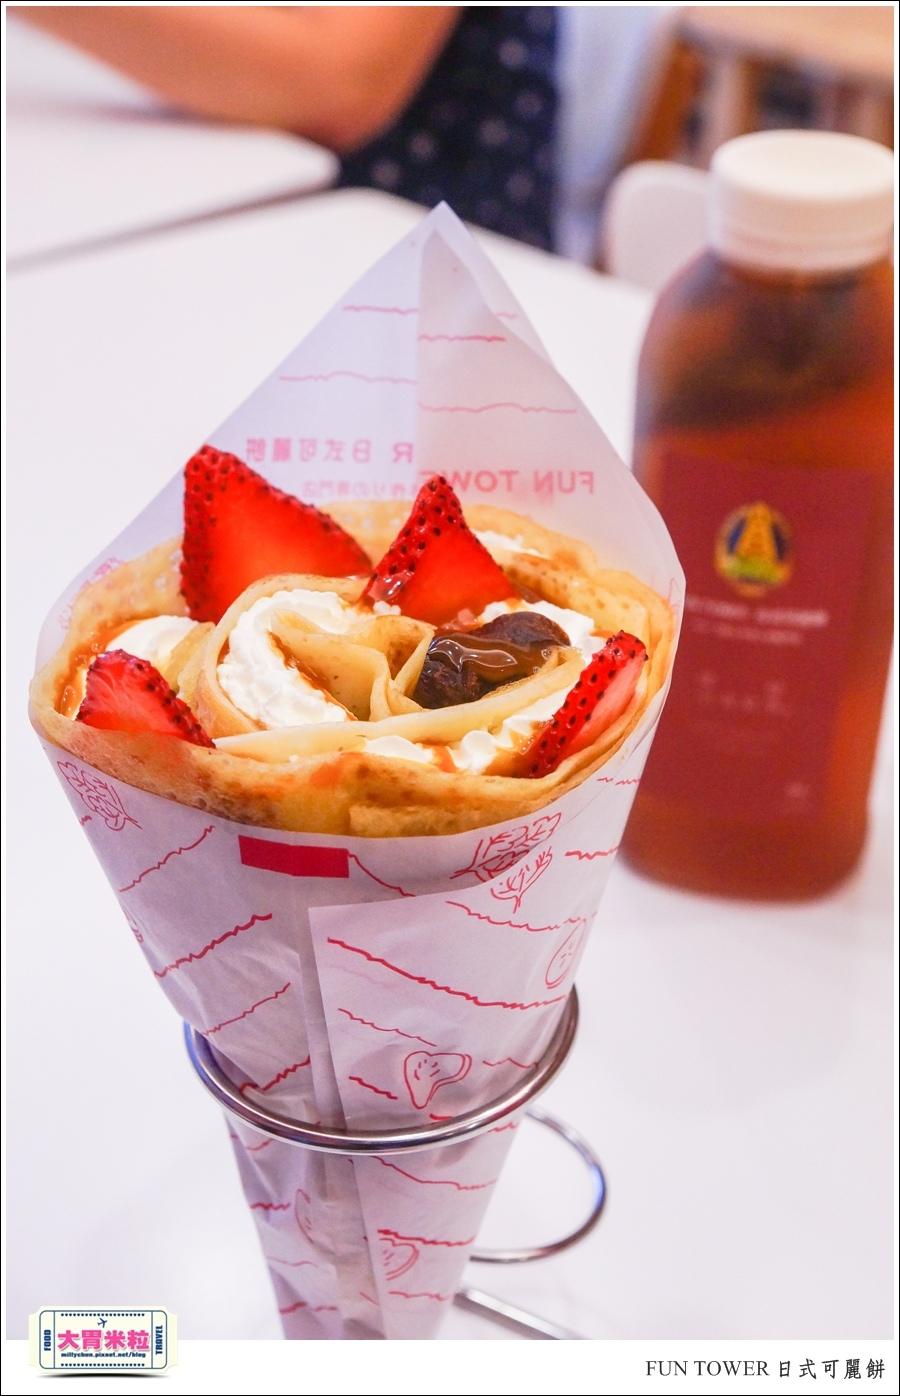 FUN TOWER日式可麗餅(高雄明華店)@高雄可麗餅甜點推薦@大胃米粒0038.jpg